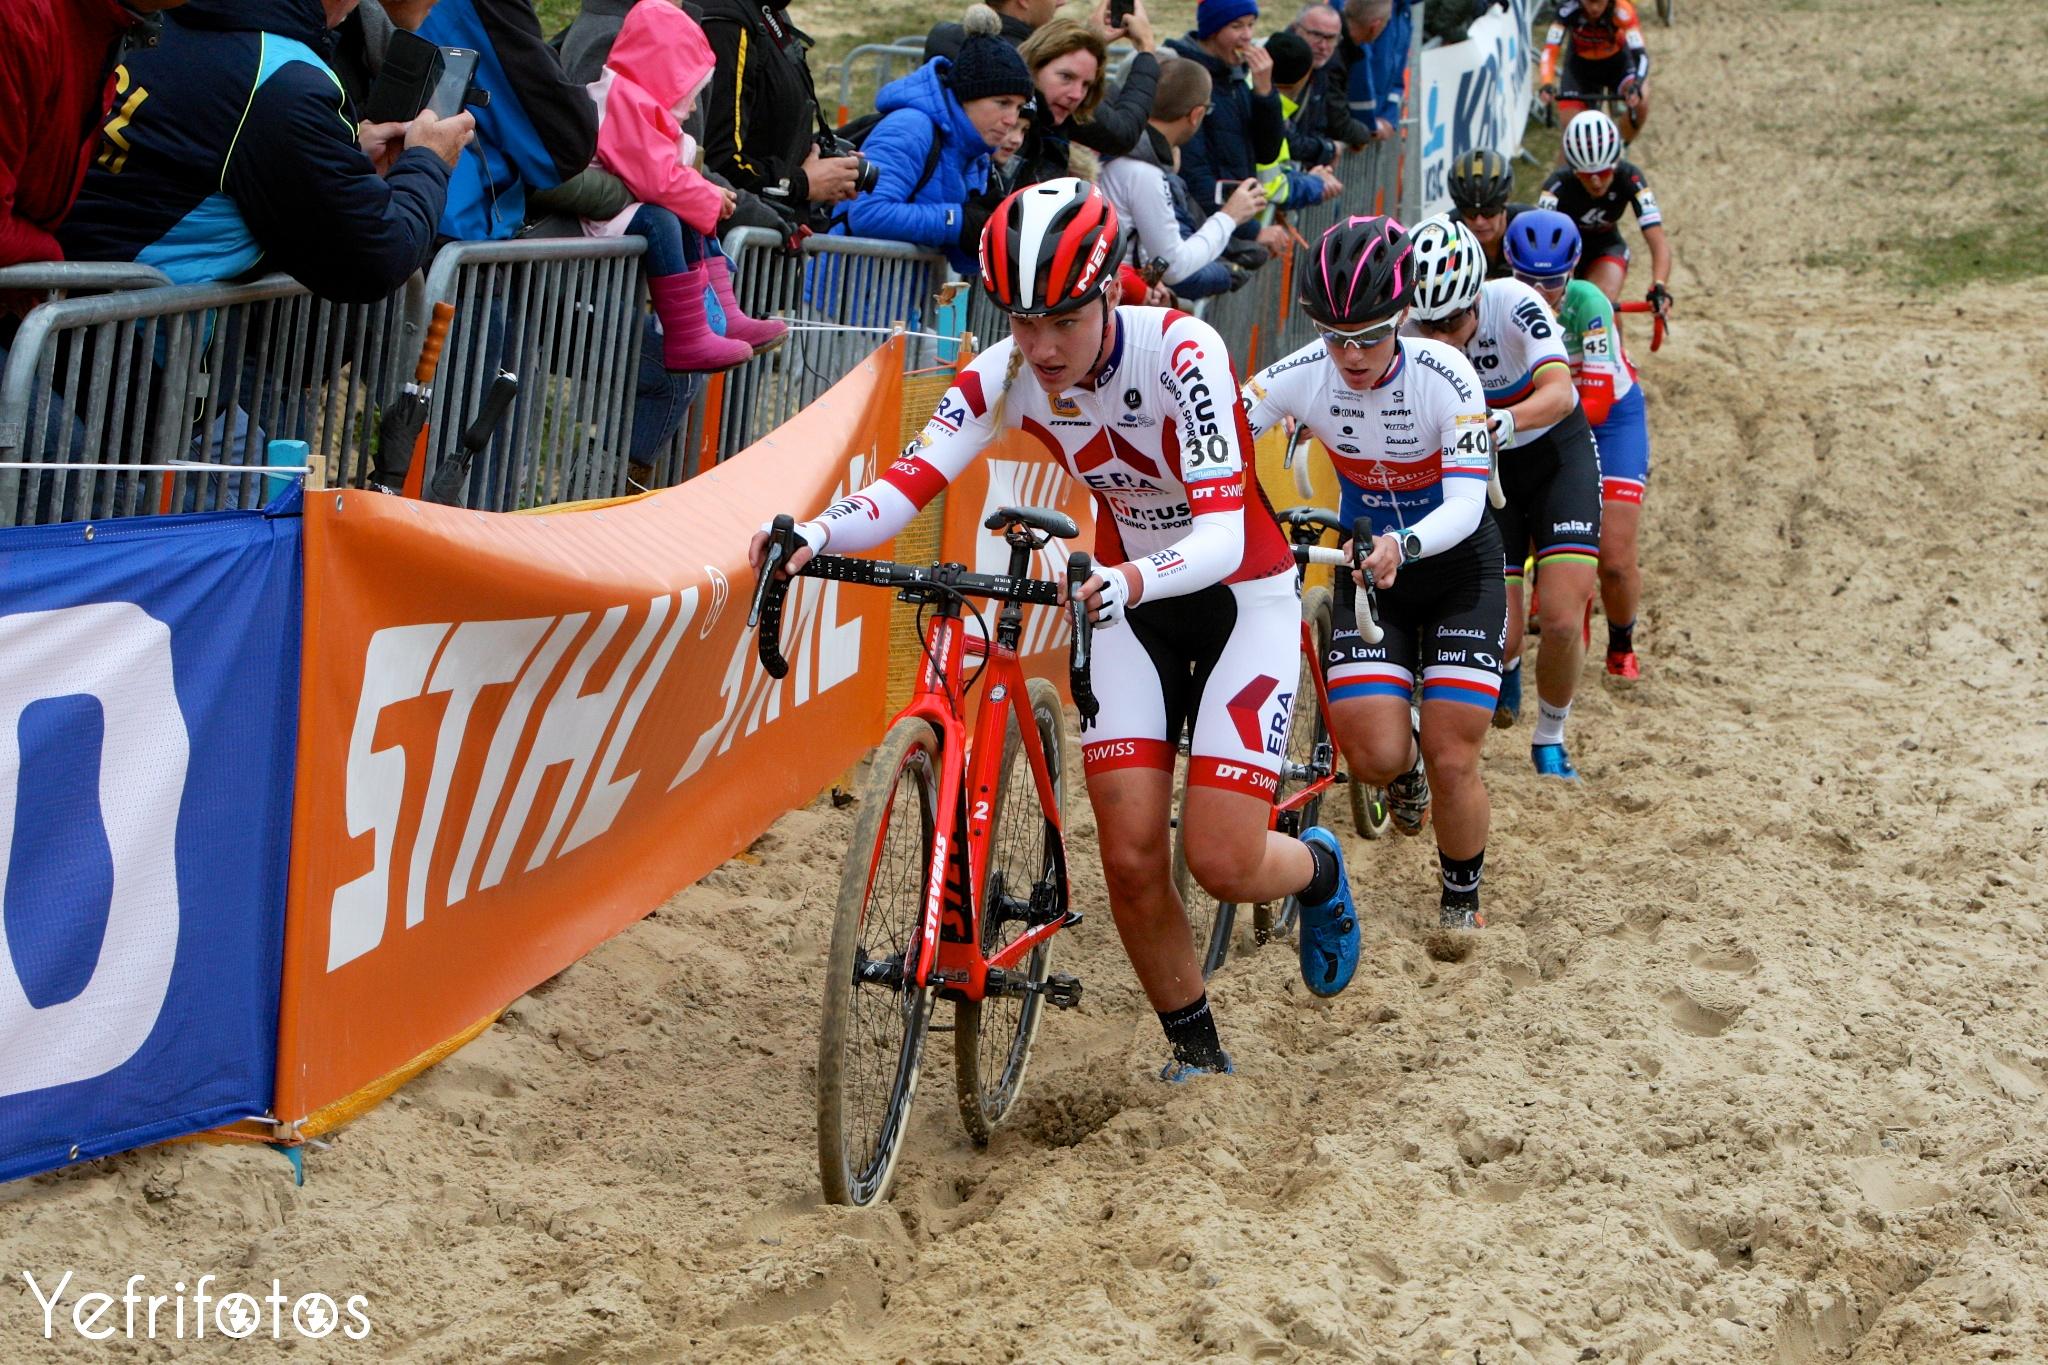 Koksijde - UCI Cyclocross World Cup - Annemarie Worst